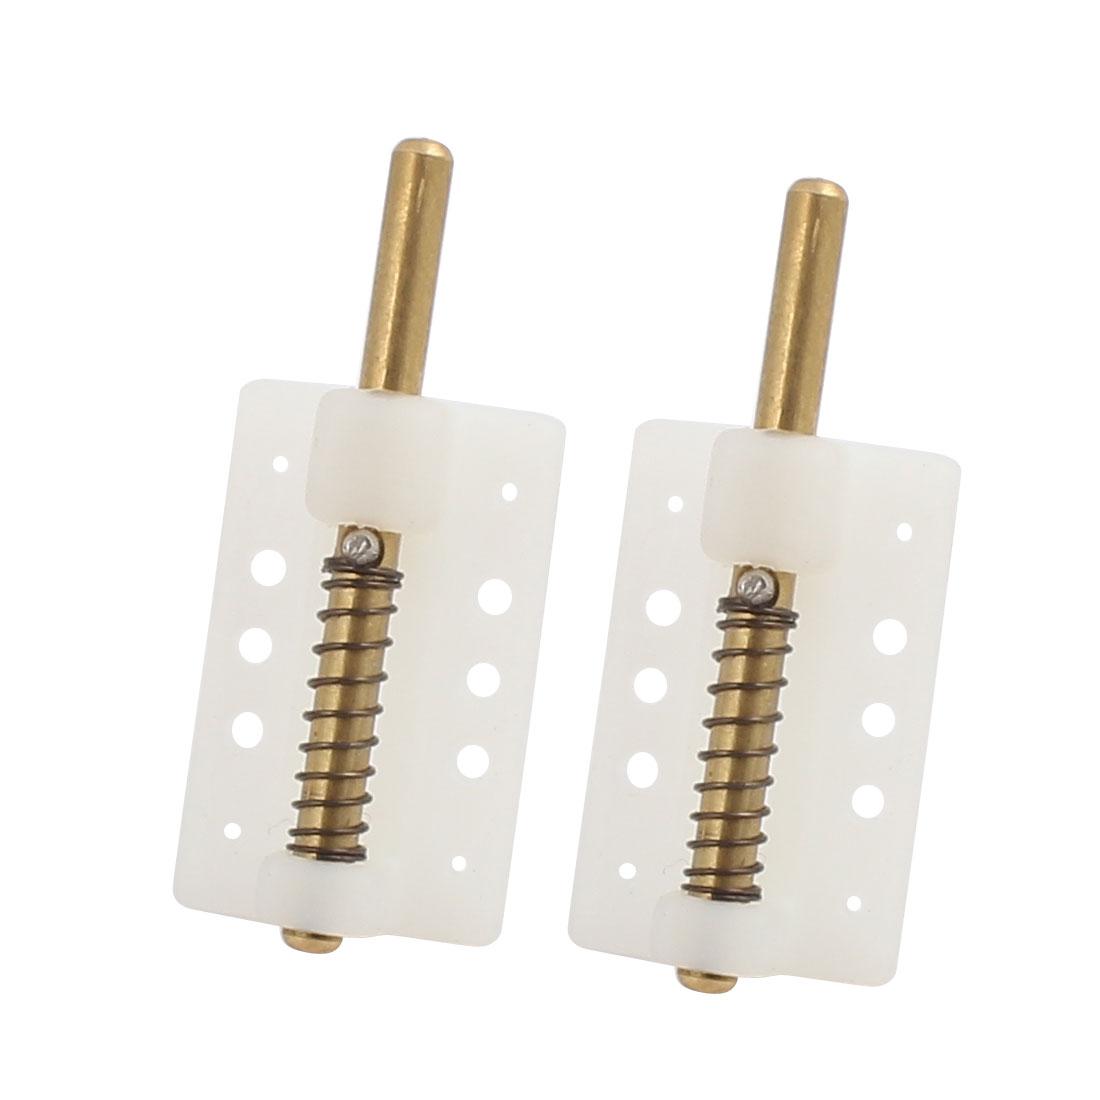 26x16x10mm Plastic Canopy Locks Cover for RC Models Accessory Translucent 2pcs